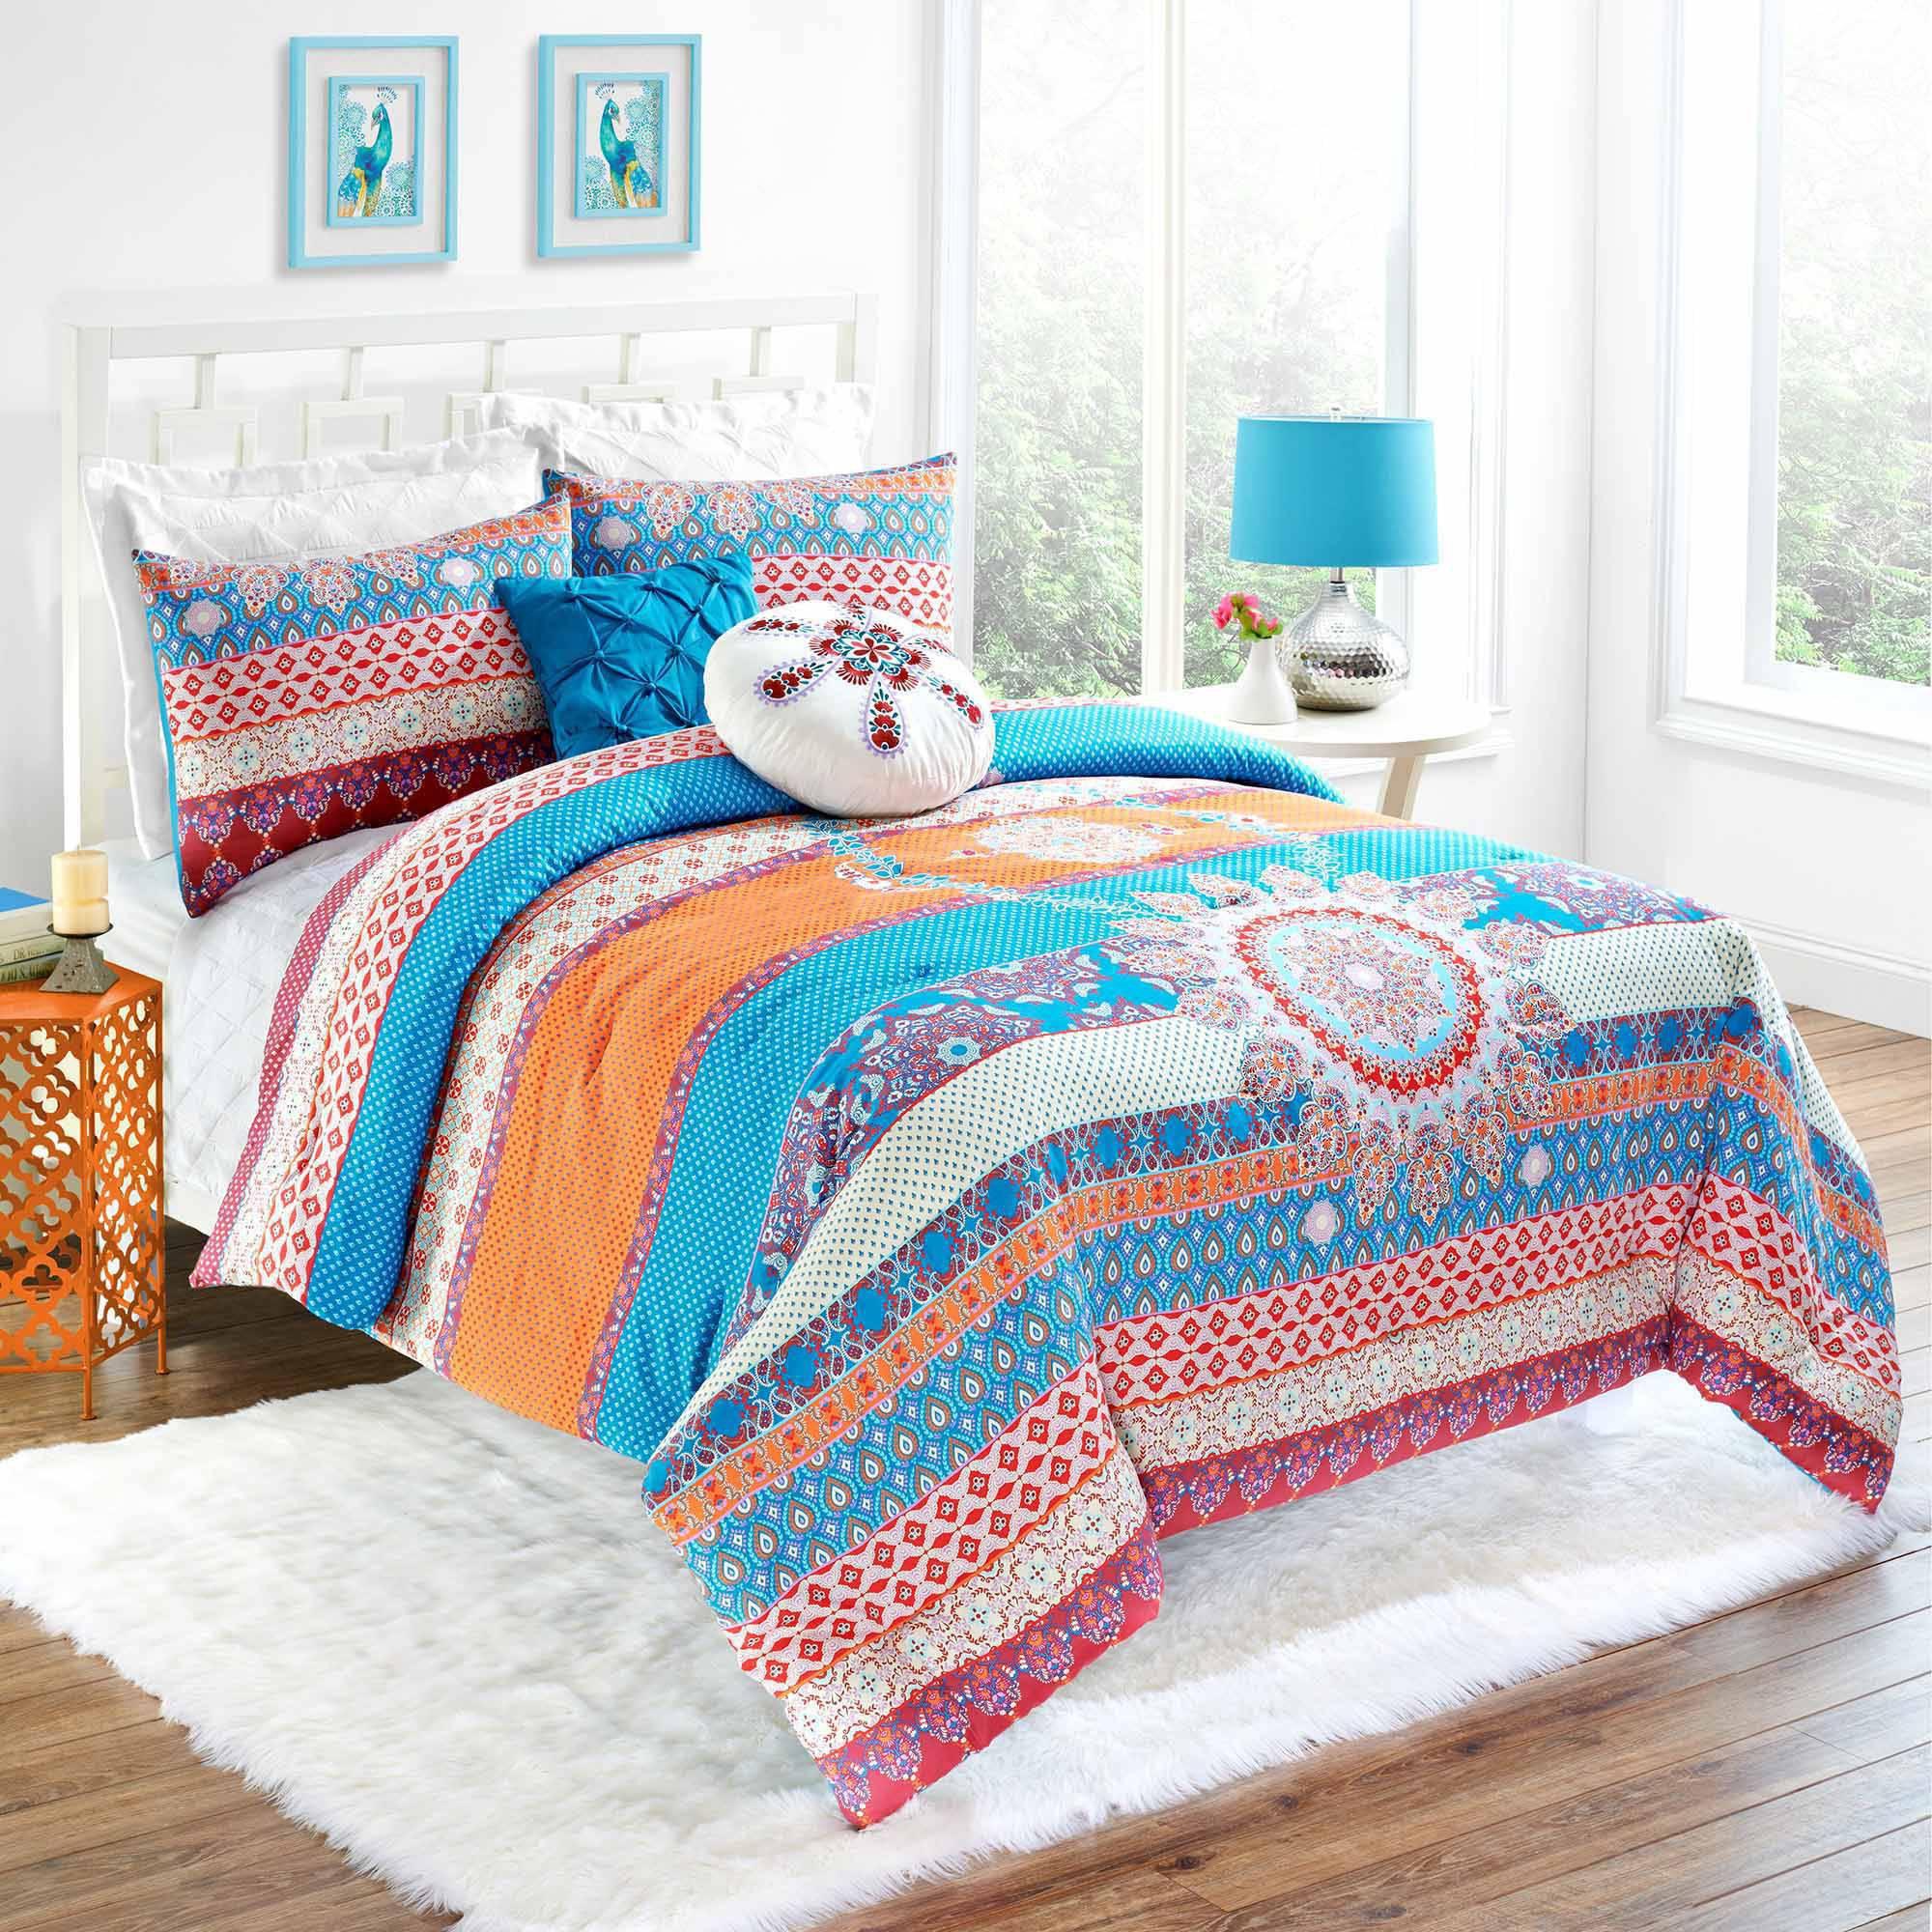 Ellery Holdings LLC Vue Vista Bedding Comforter Set